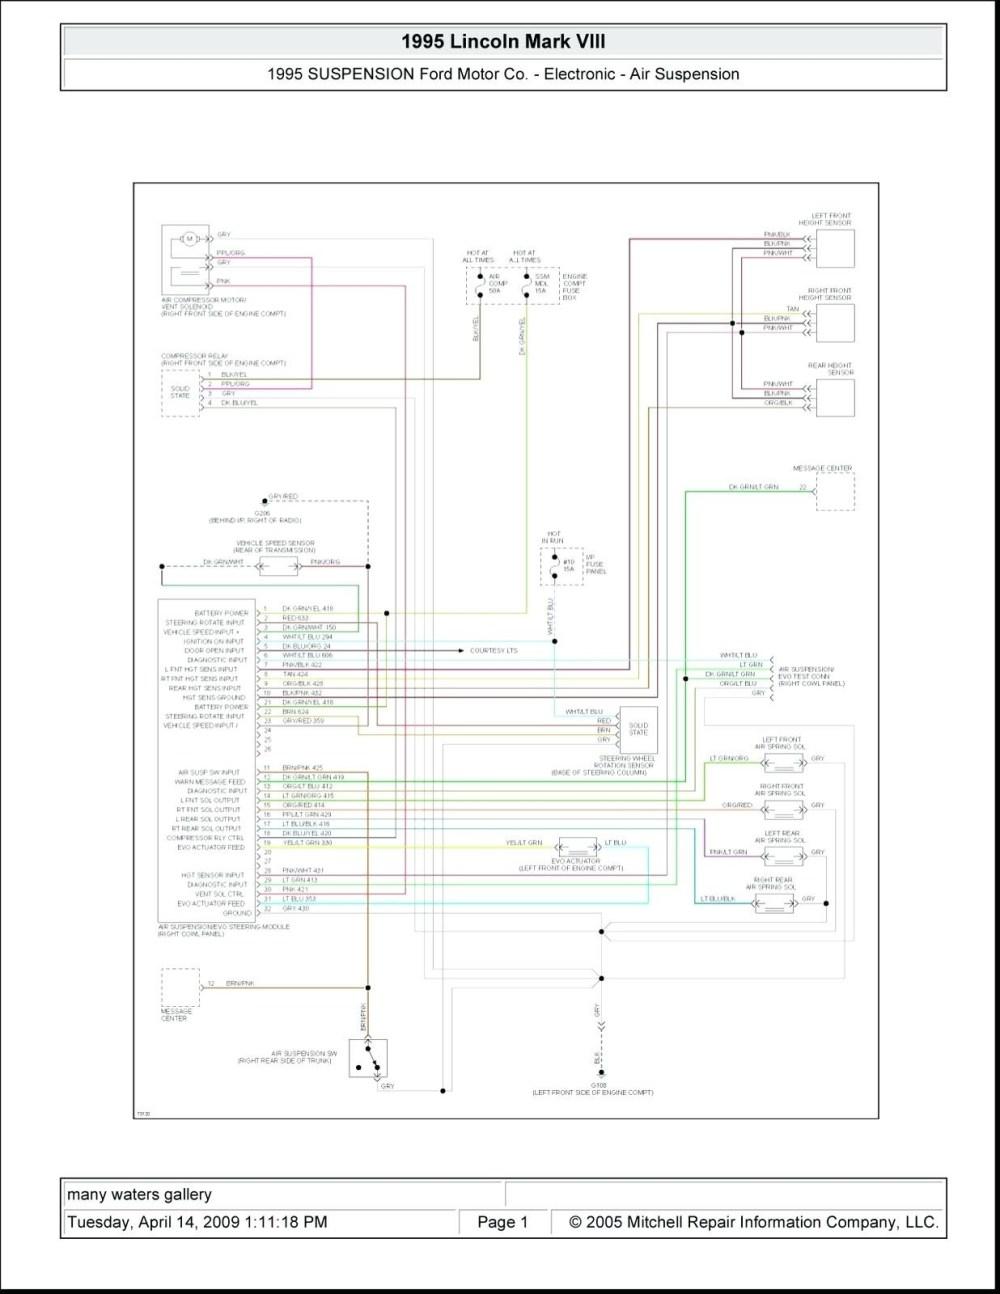 medium resolution of icn 4p32 n wiring diagram icn 4p32 n wiring diagram advance icn 4p32 n soundr